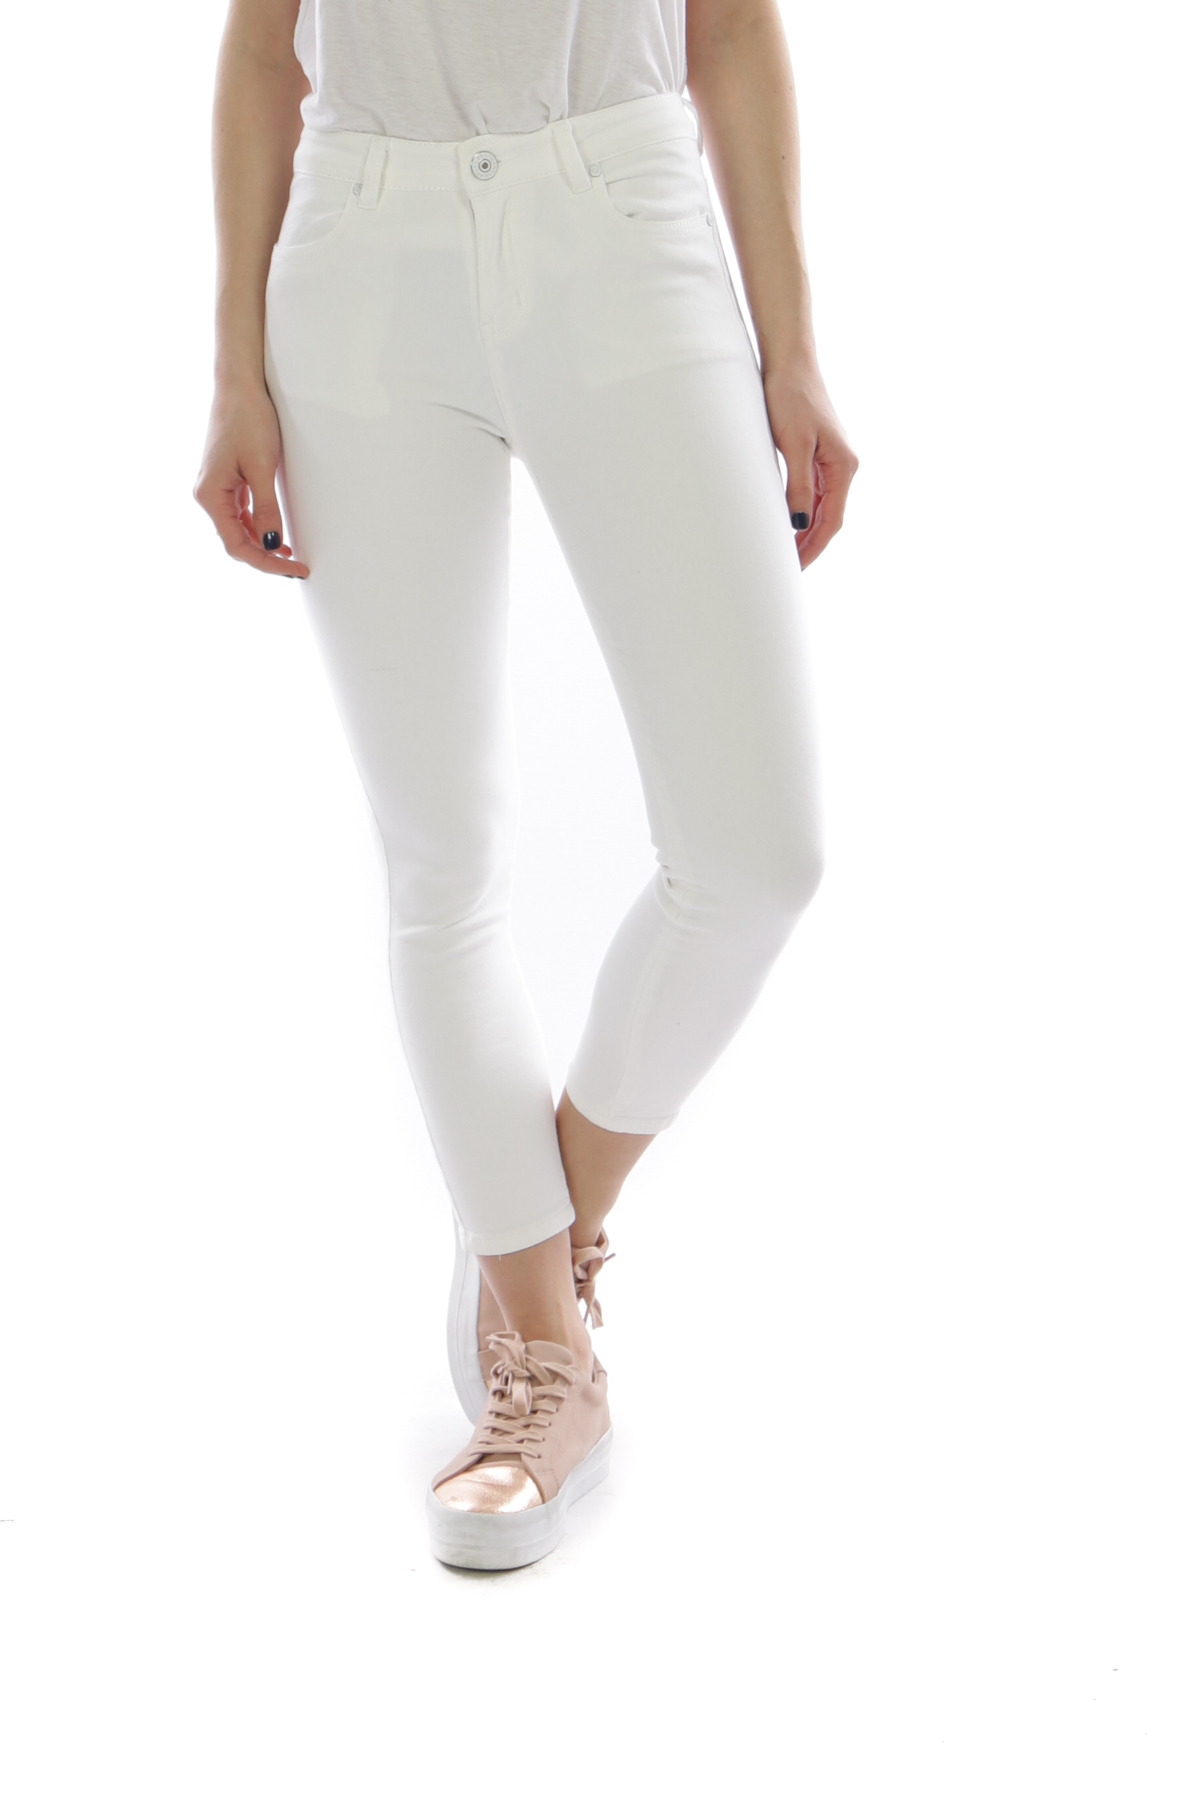 Jeans Femme Blanc LOVA CHIC H6123 #c eFashion Paris